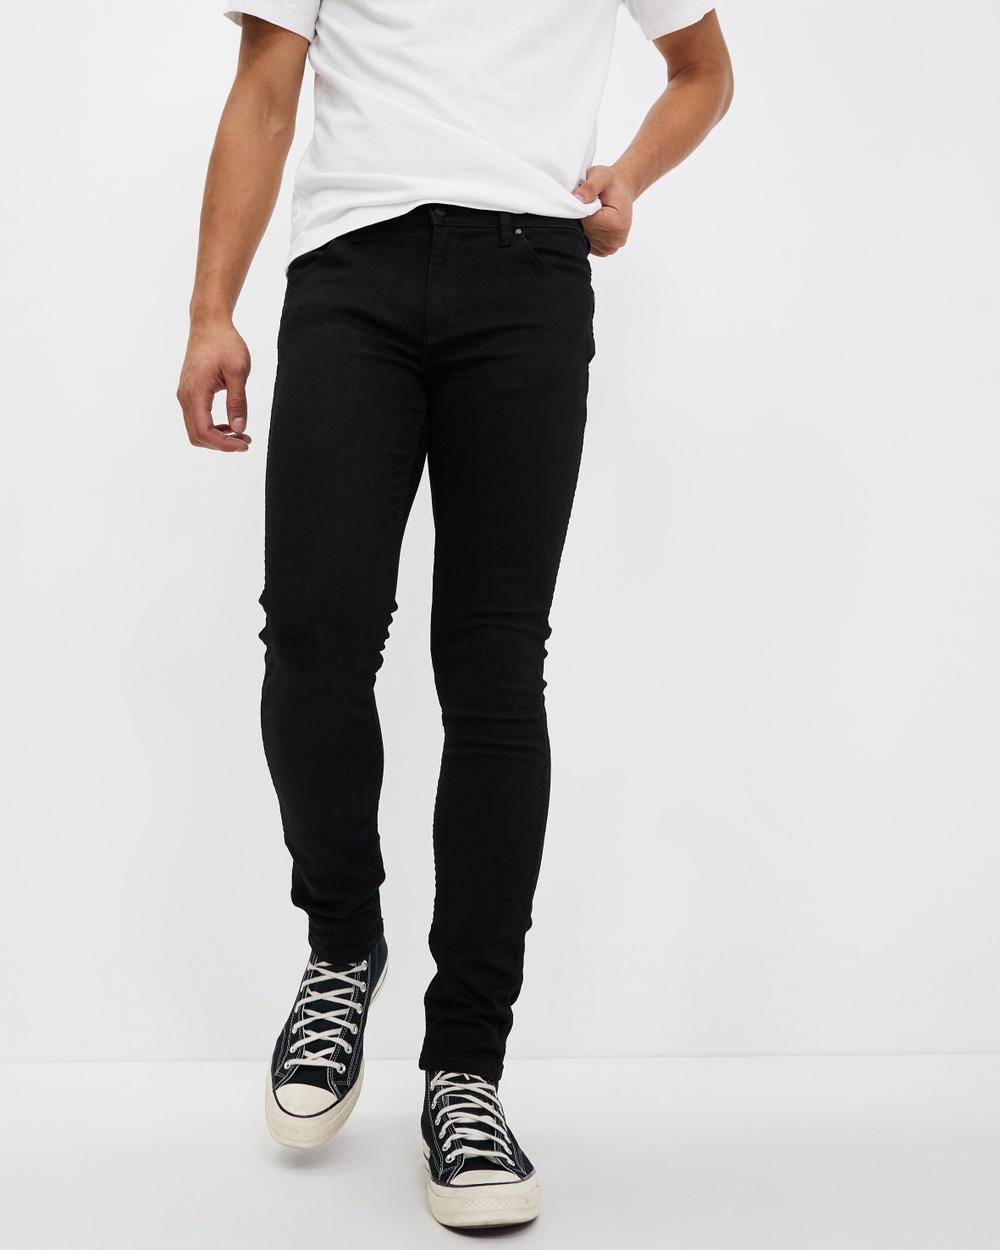 Wrangler Stomper Jeans Slim Super Sonic Black Australia